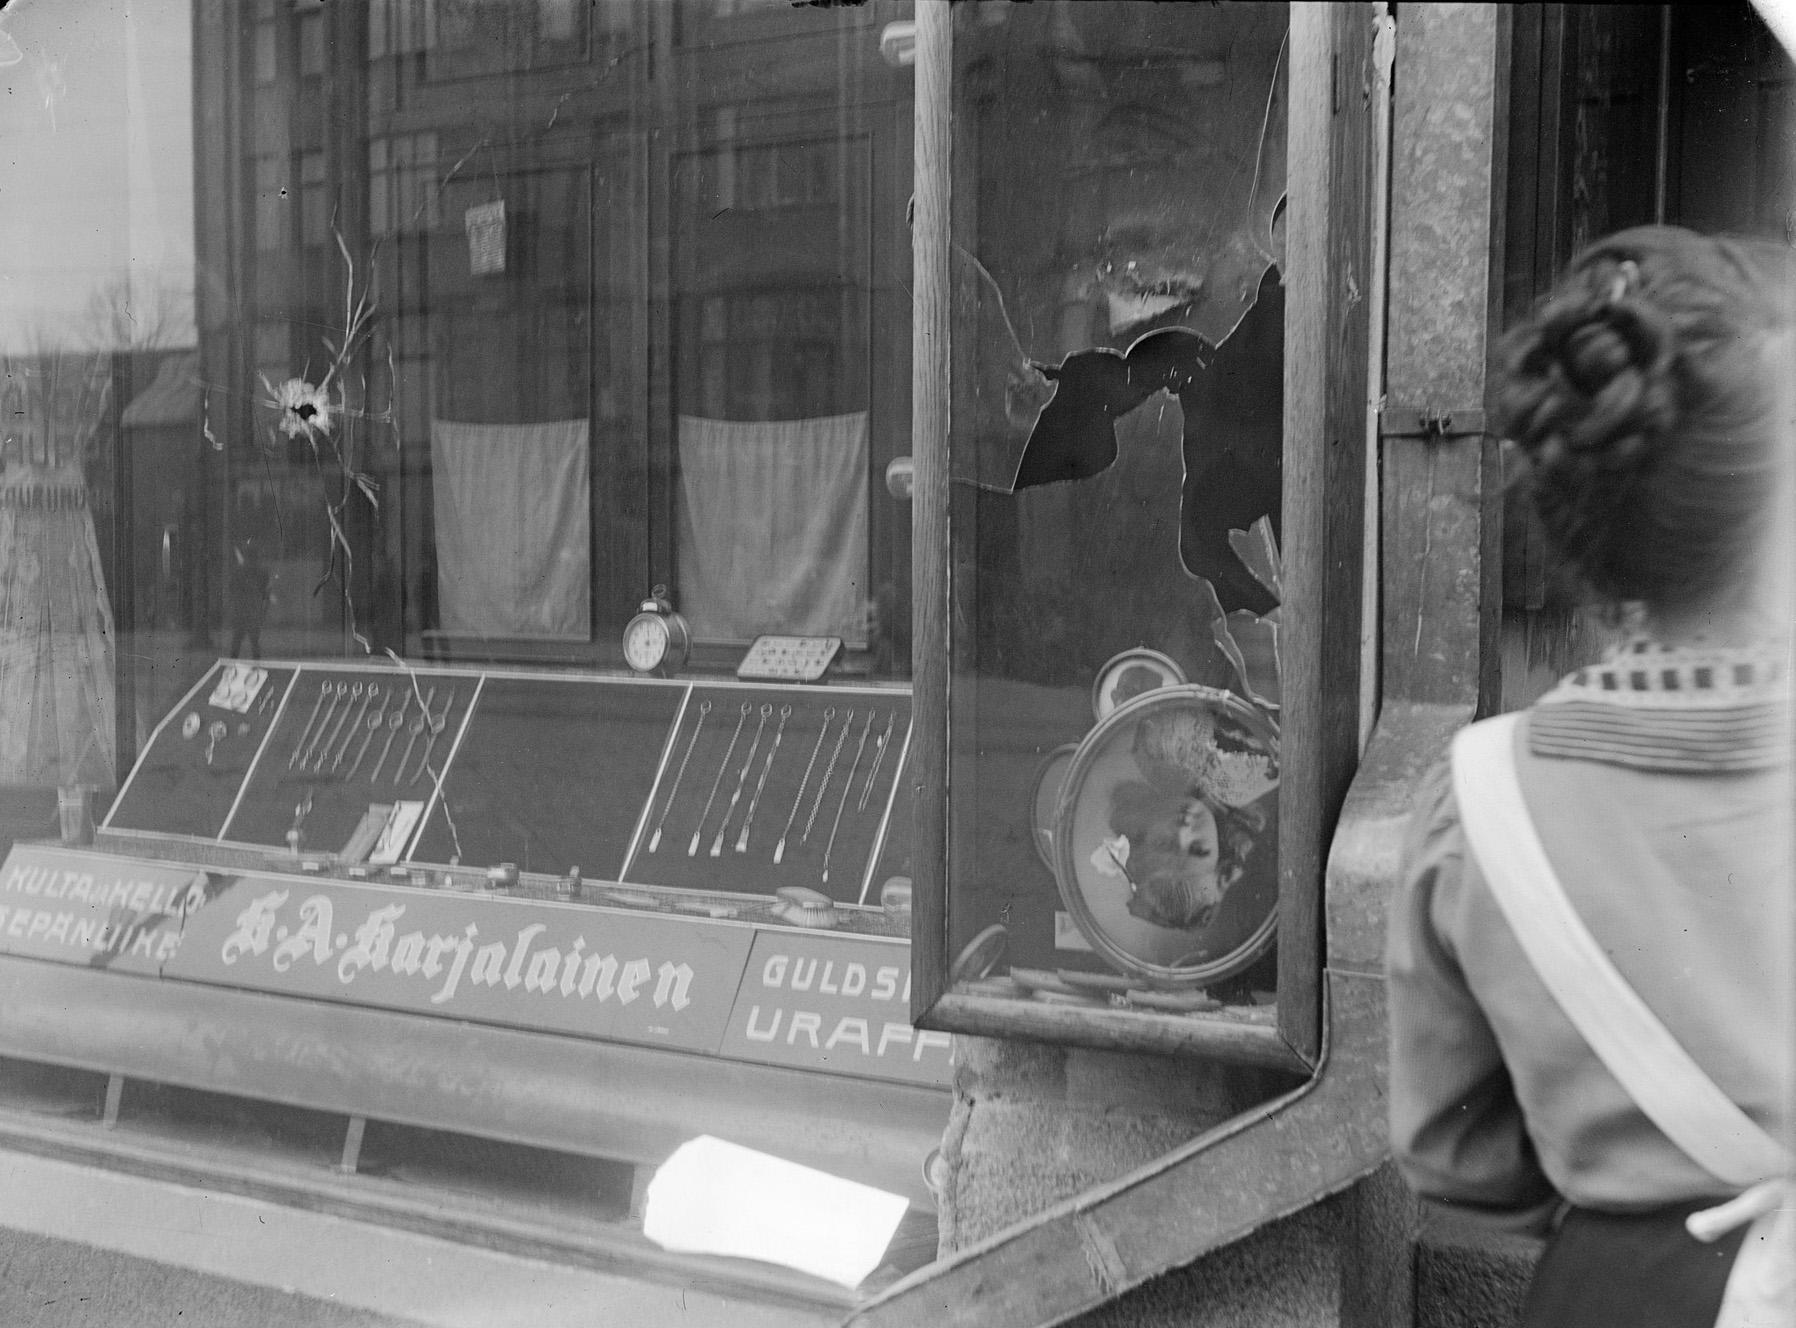 The broken window of Tyyne Böök's photography studio in Siltasaarenkatu, Helsinki, April 12, 1918. Photo: Tyyne Böök / The Finnish Museum of Photography